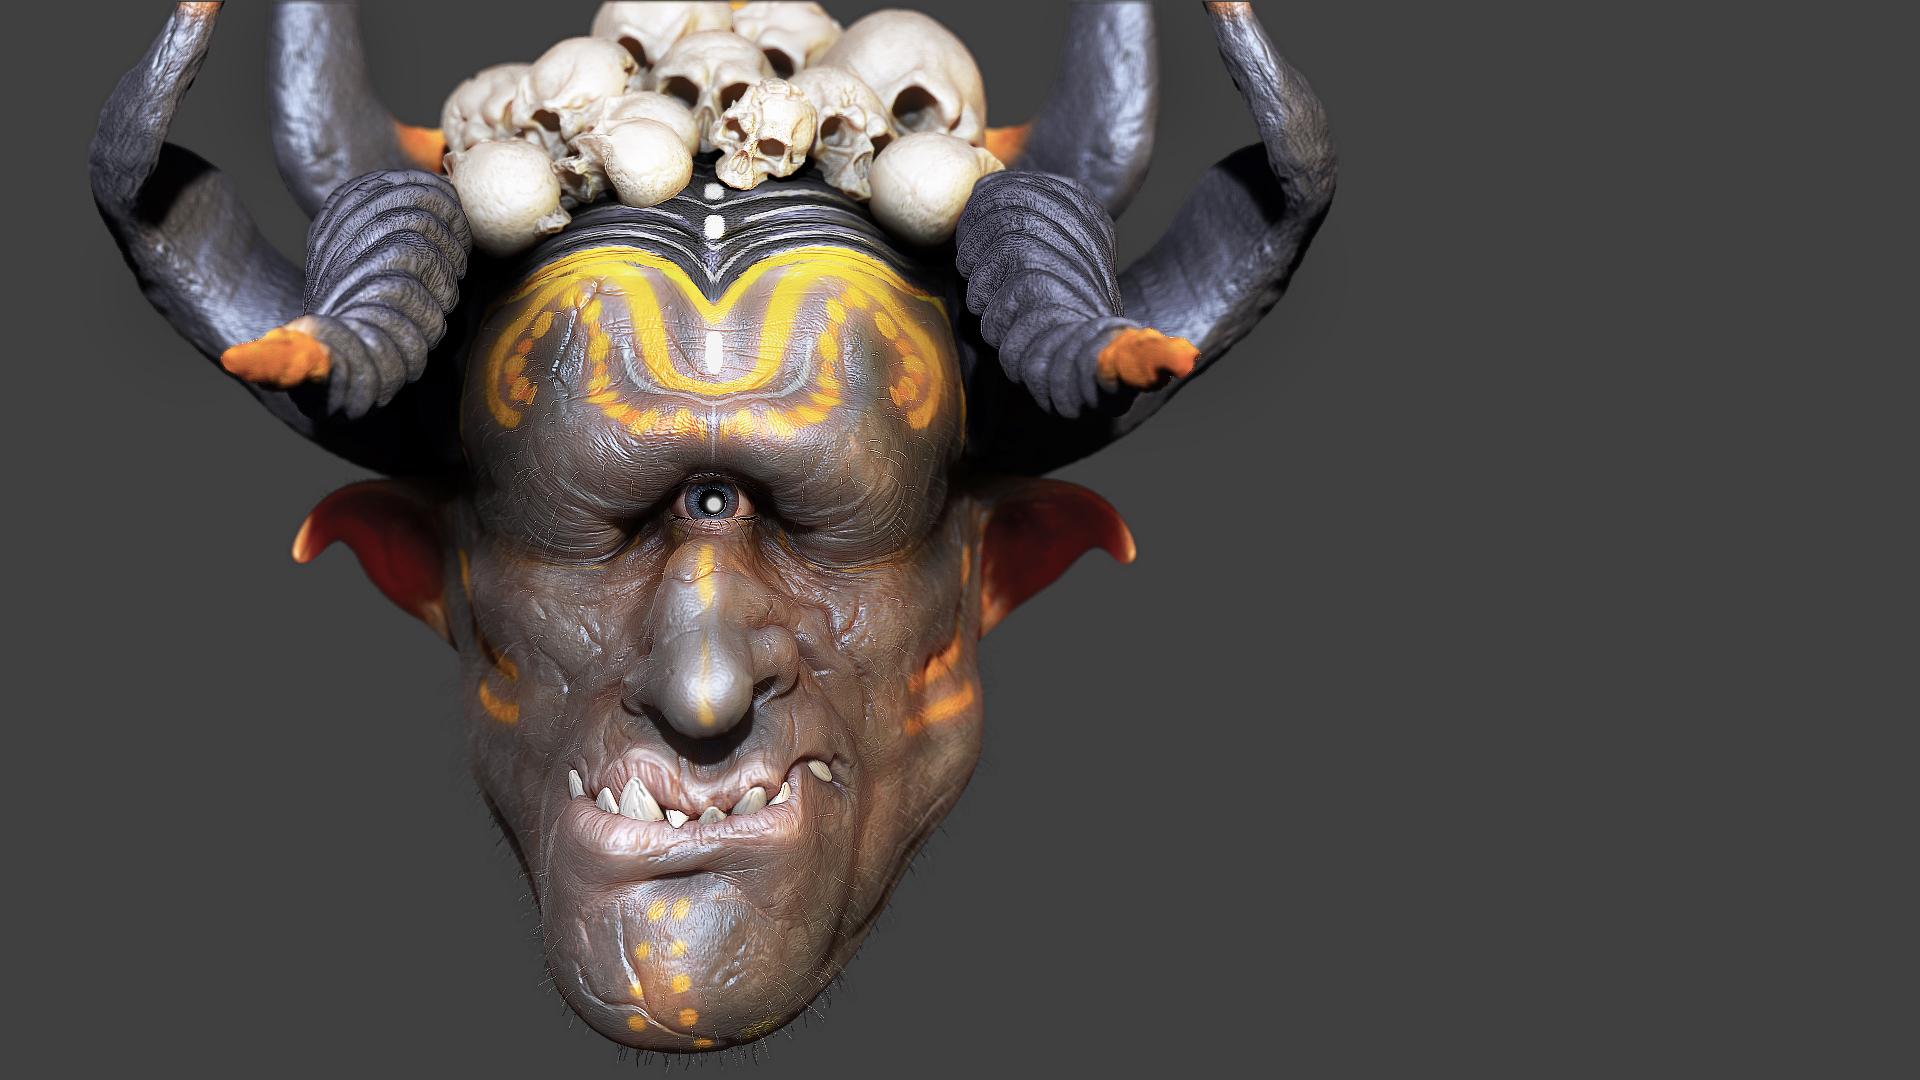 Cyclops character by iskander71